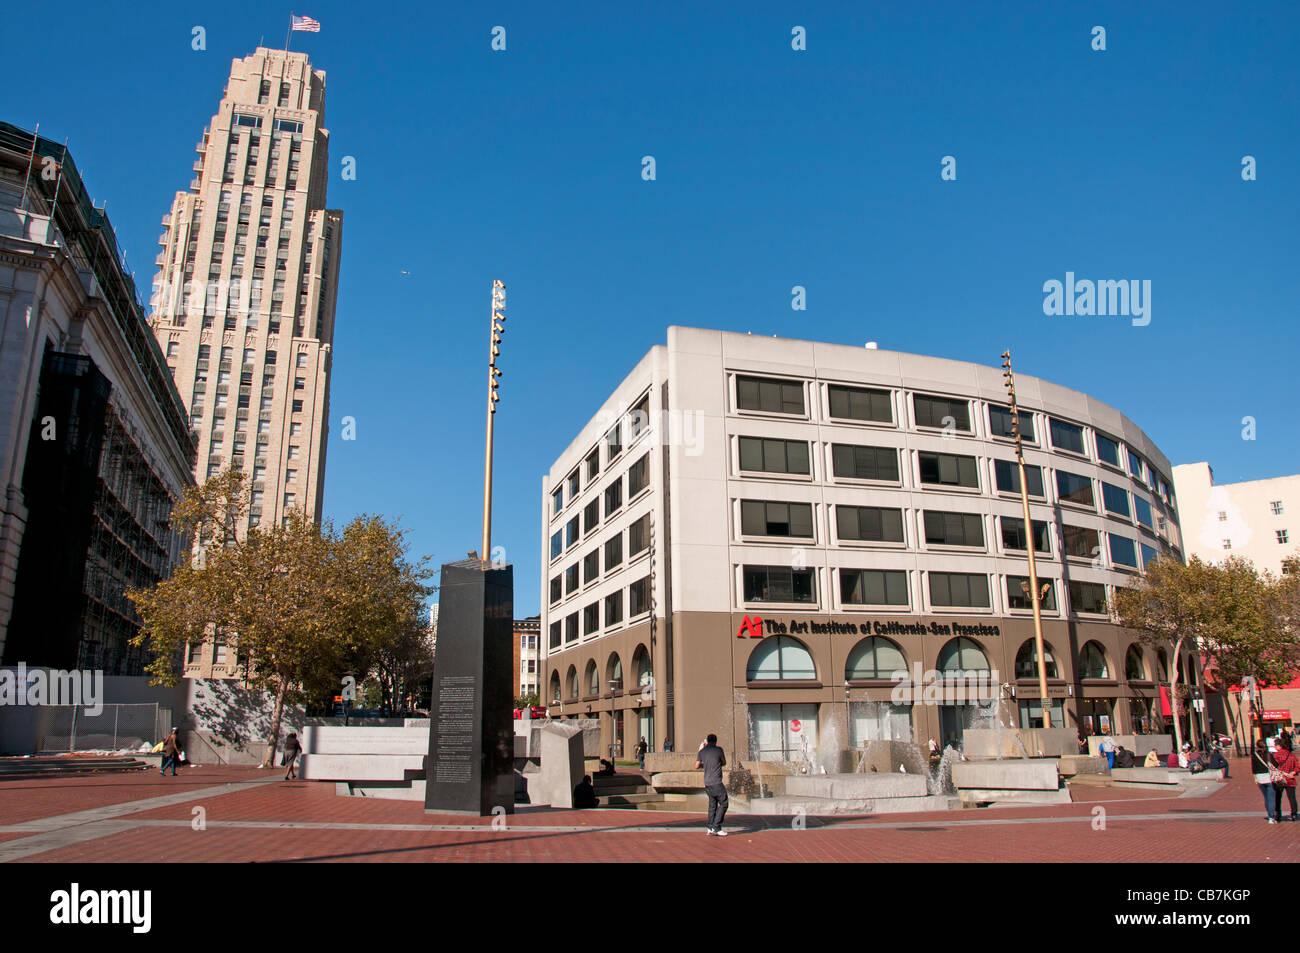 Civic Center San Francisco California USA American United States of America - Stock Image